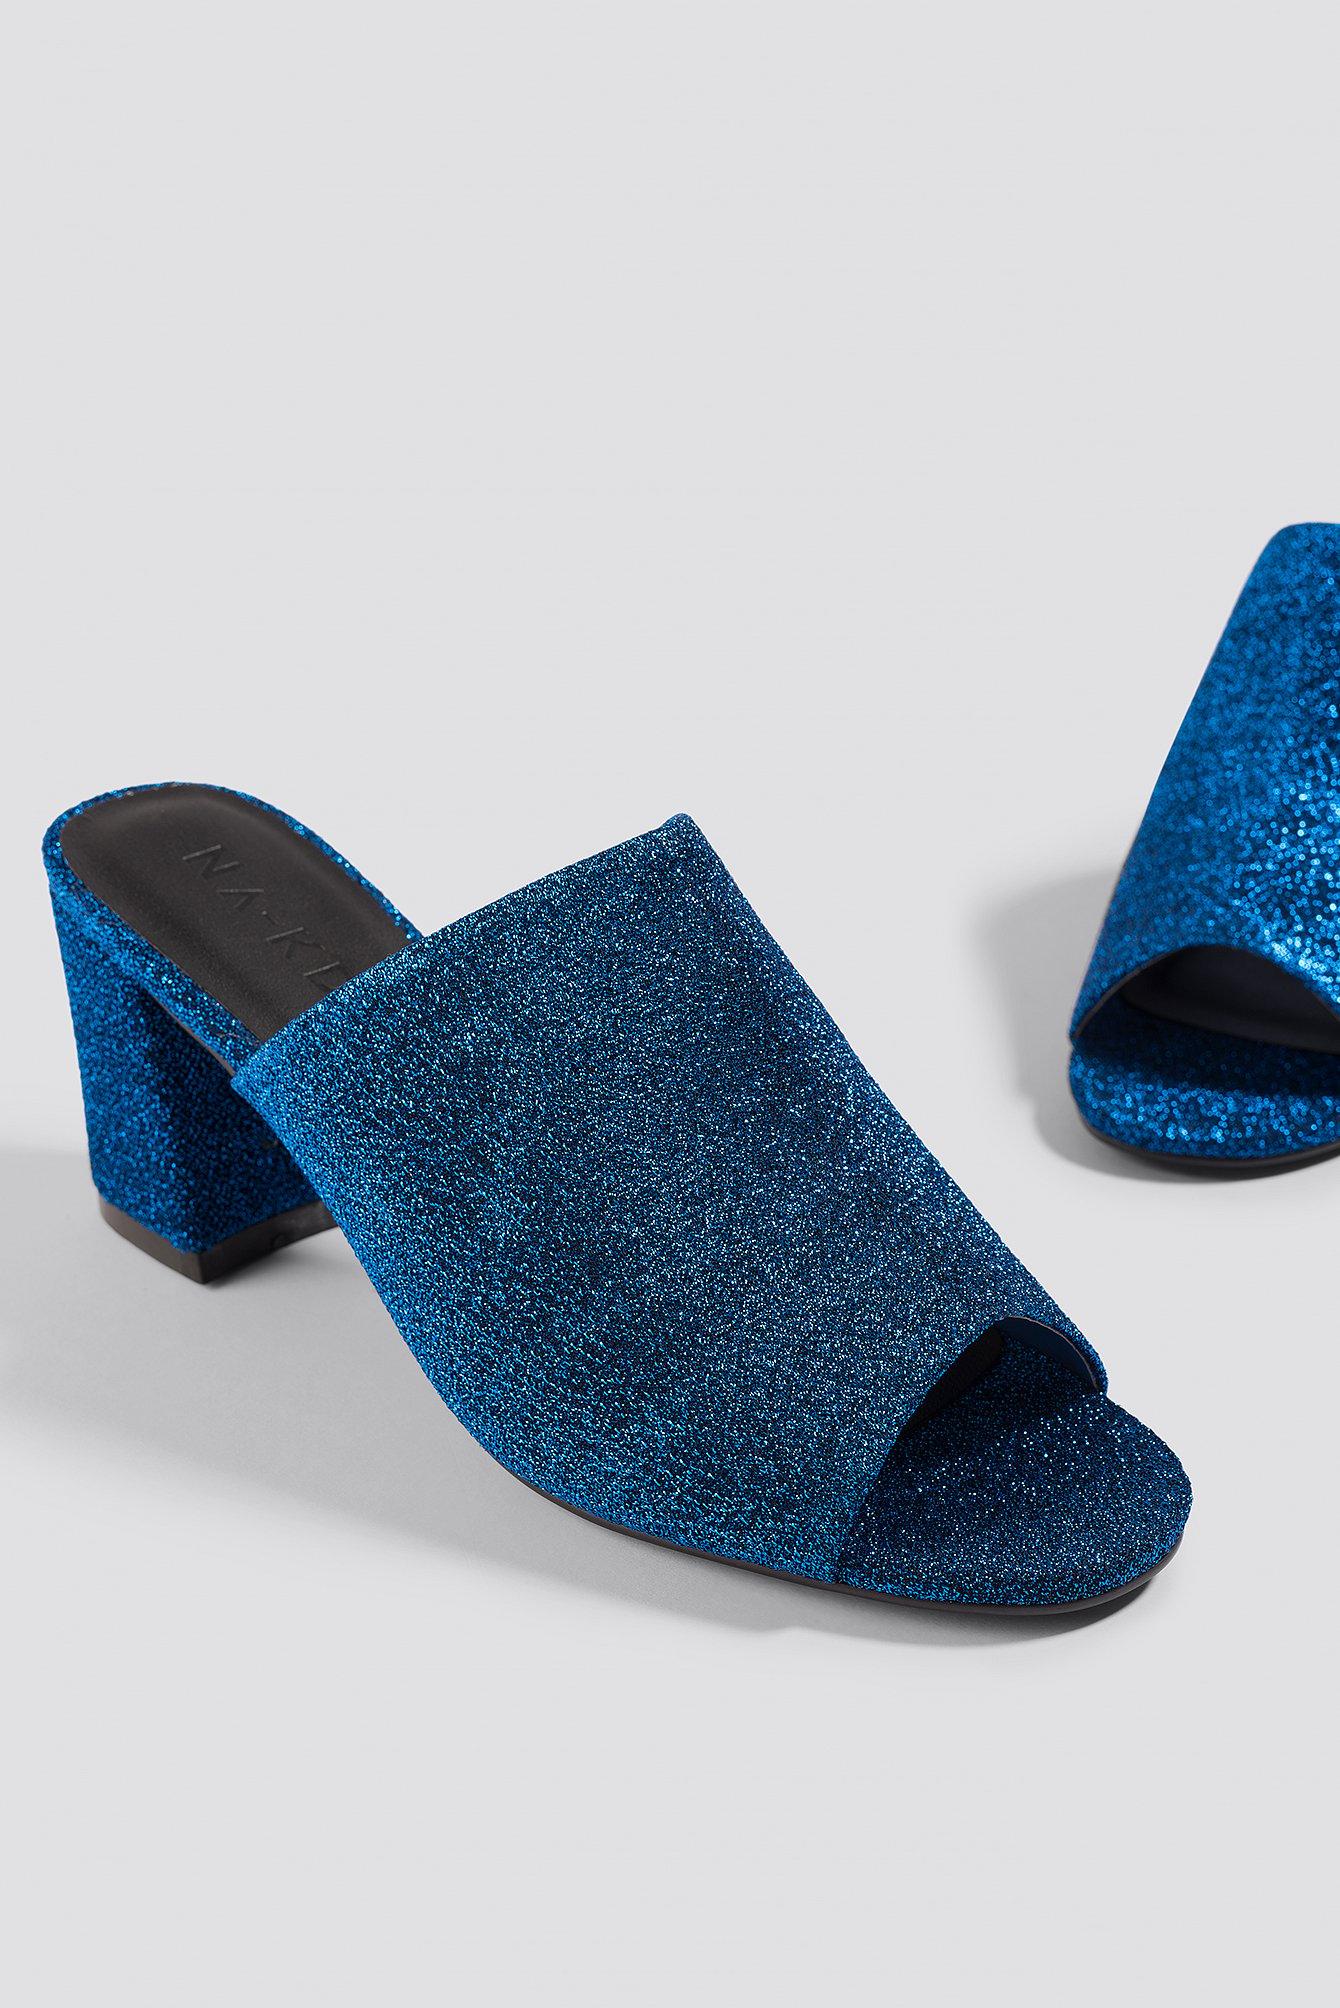 na-kd shoes -  Glitter Mule Heel Sandals - Blue